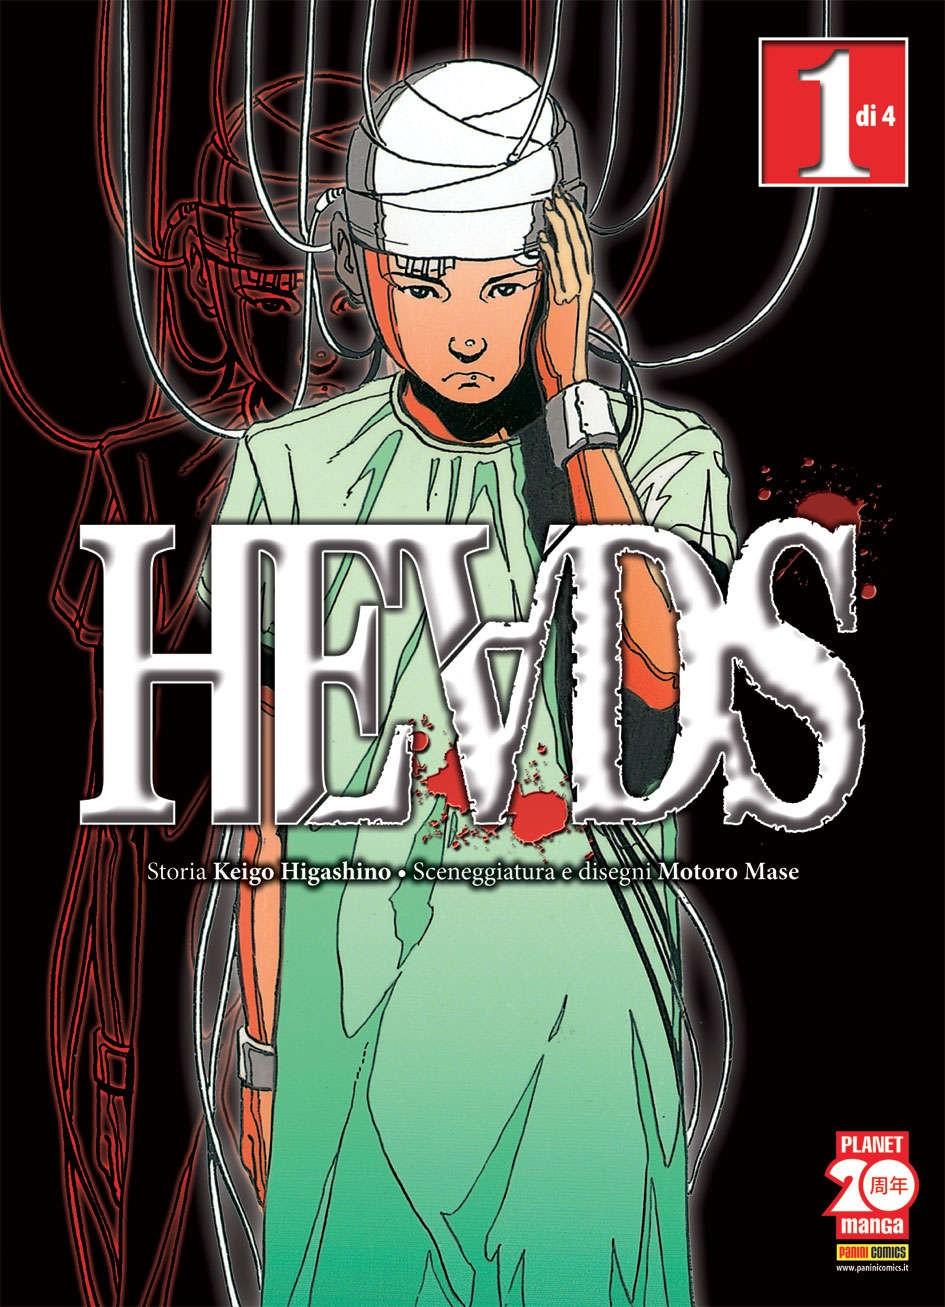 Heads - N° 1 - Heads (M4) - Manga Life Planet Manga